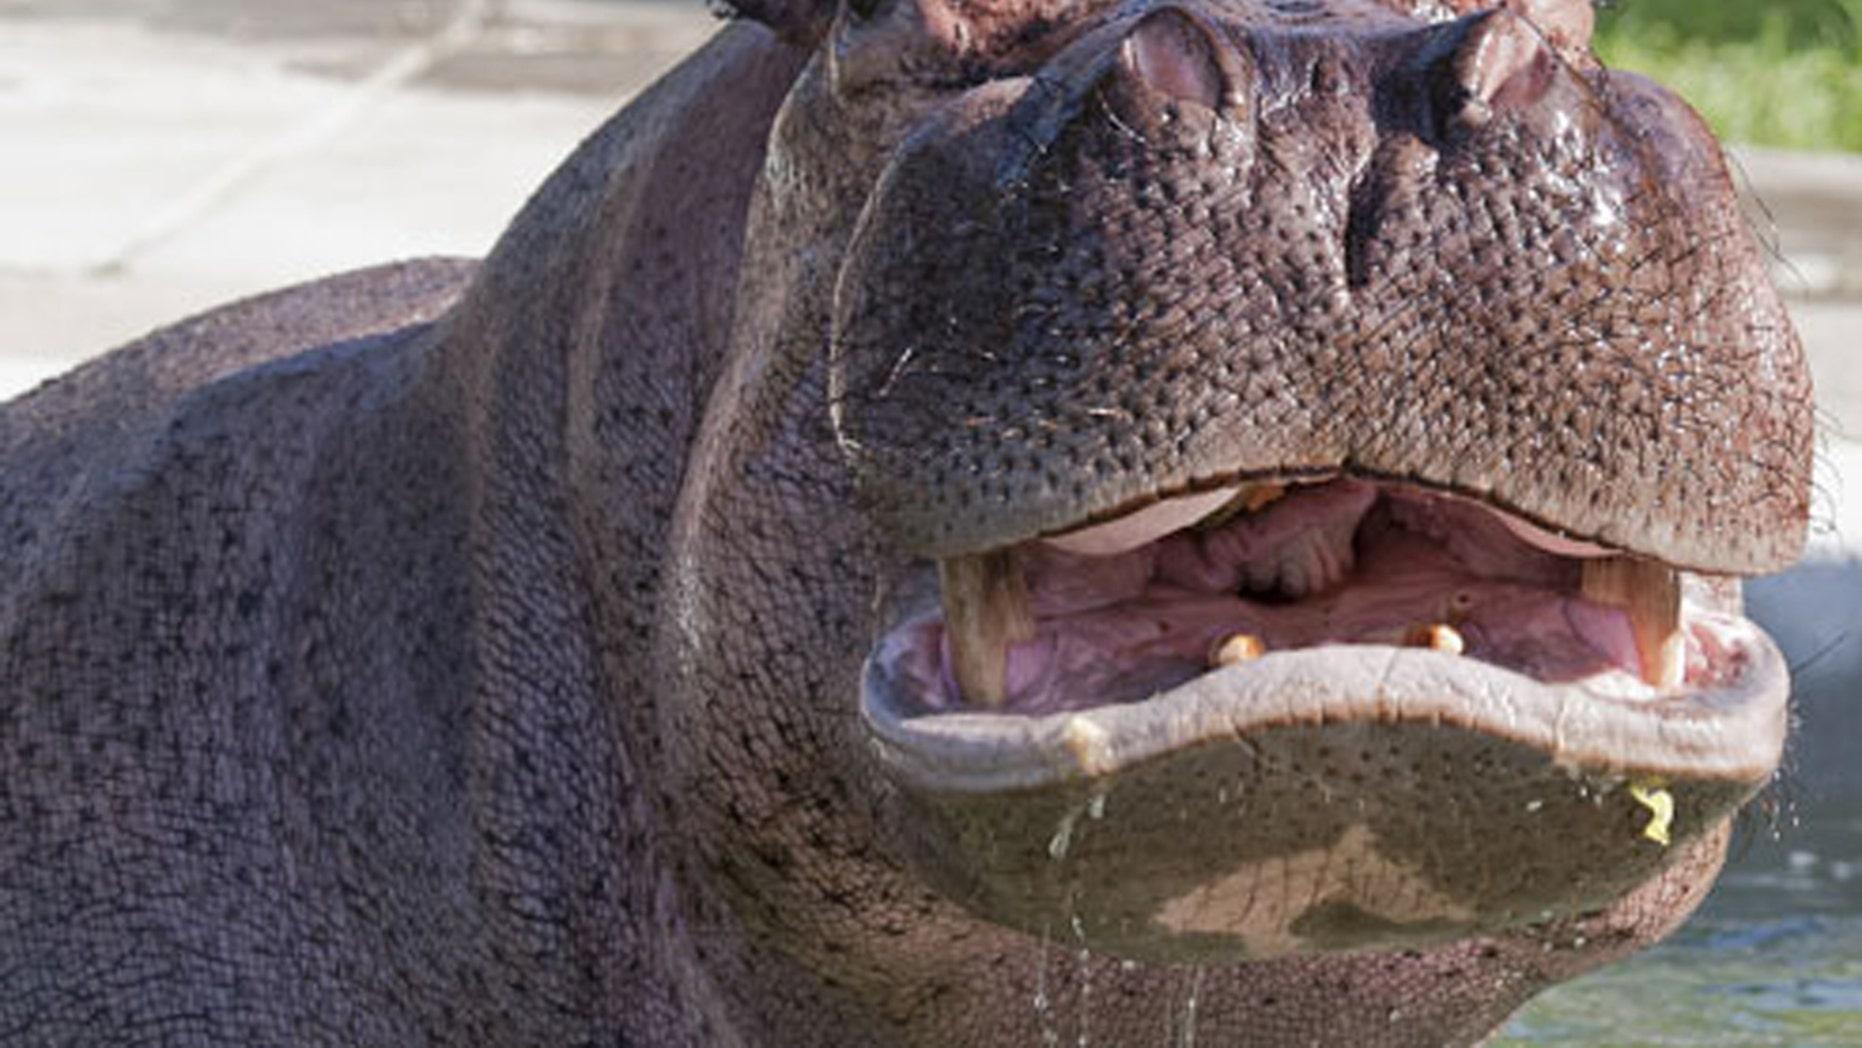 Hippo attacks in Kenya kill 2, including Taiwan tourist